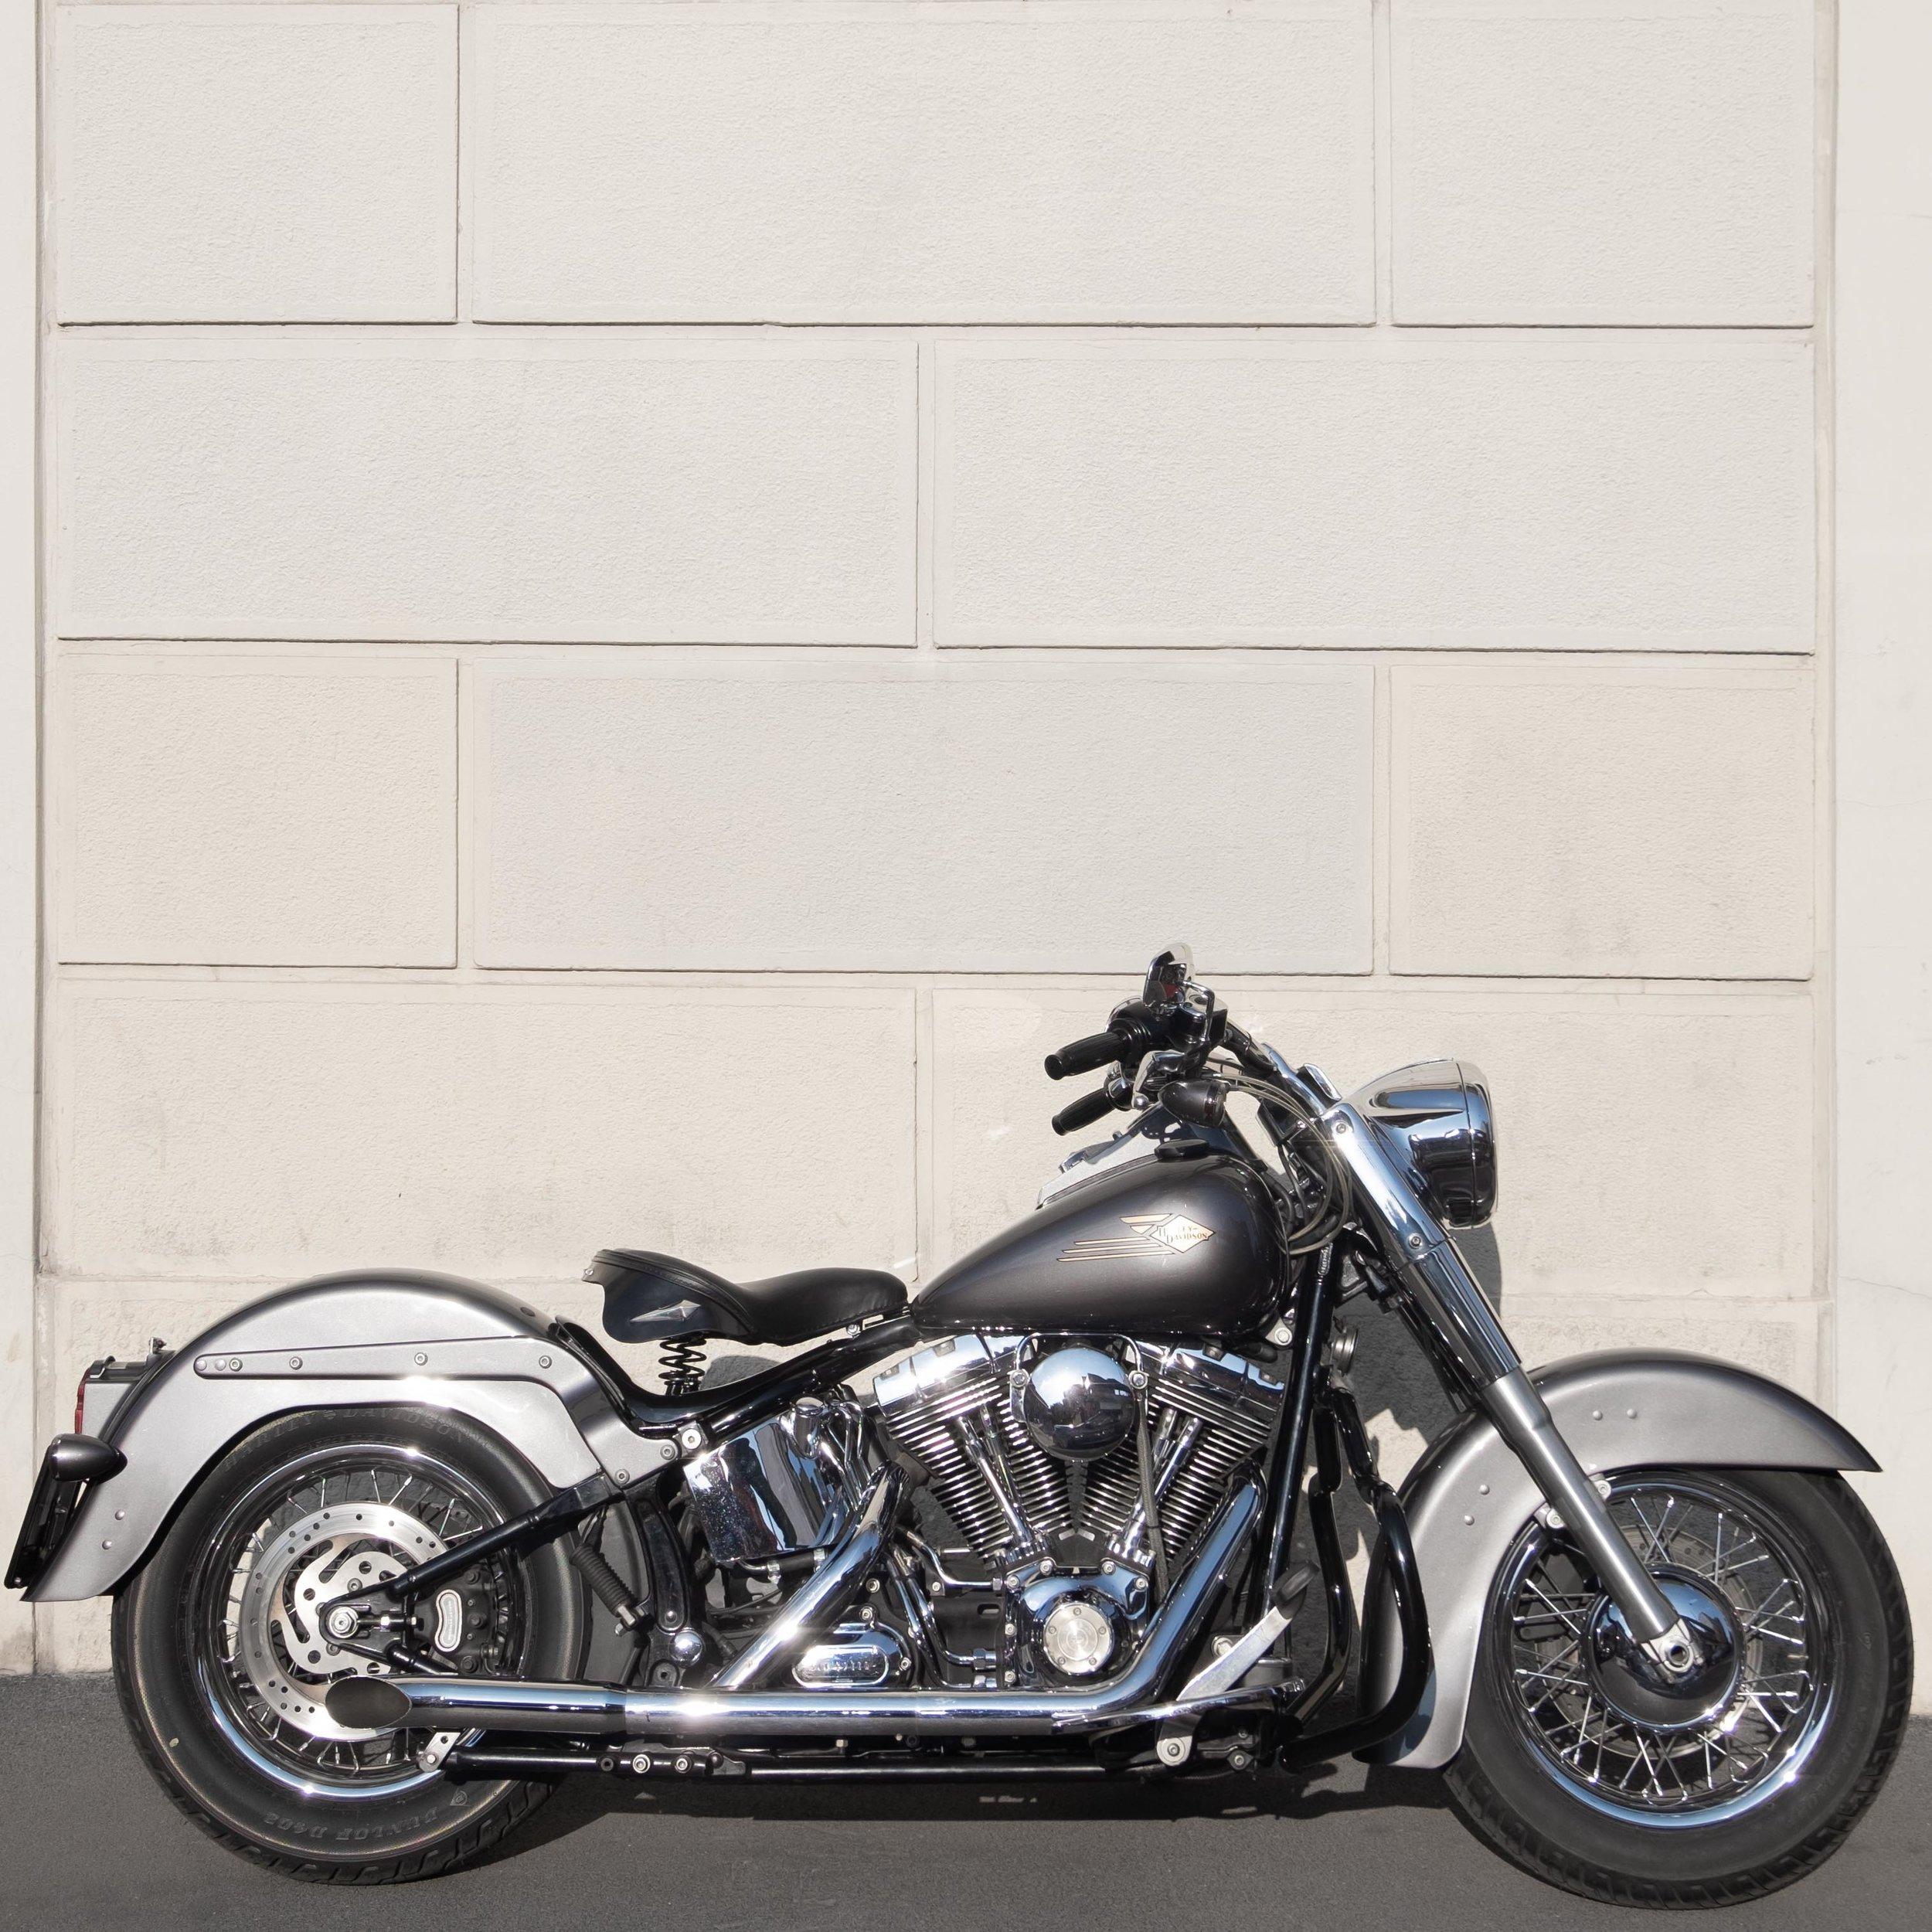 Marca: Harley Davidson Modello: Softail Deluxe  0 69